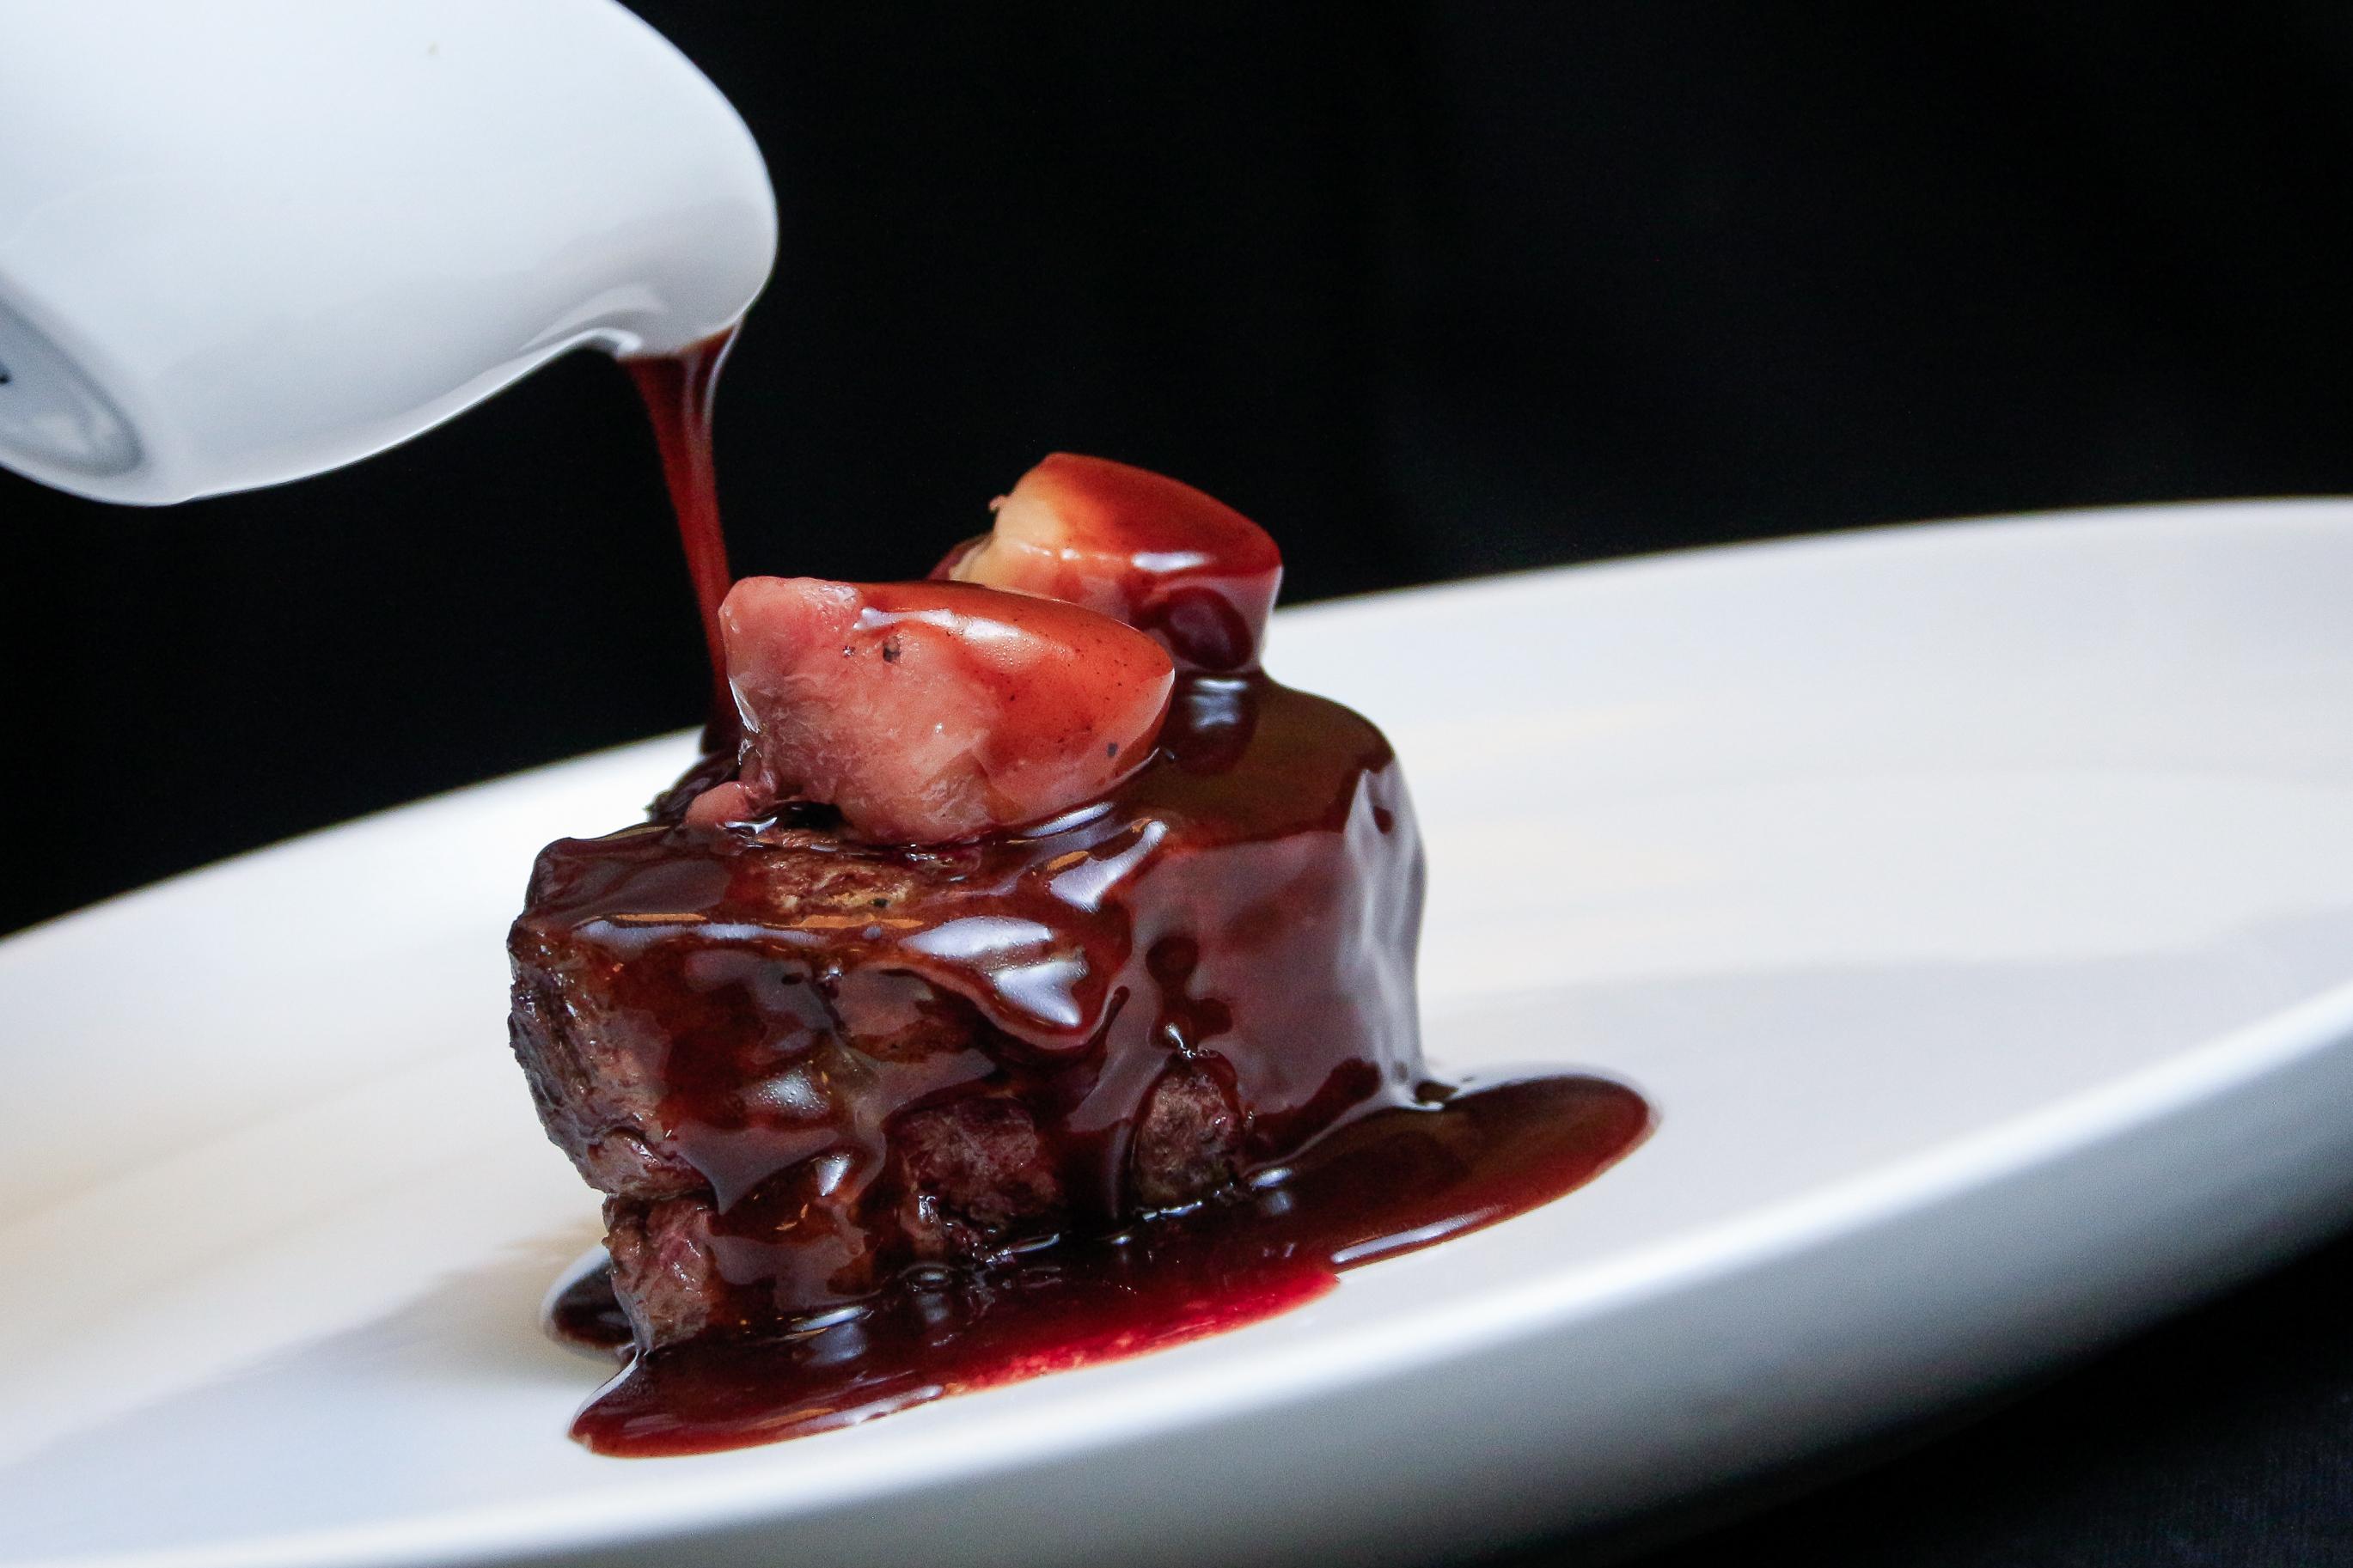 Legends of French Cuisine | Cena con estrella de la mano del Chef César Troisgros